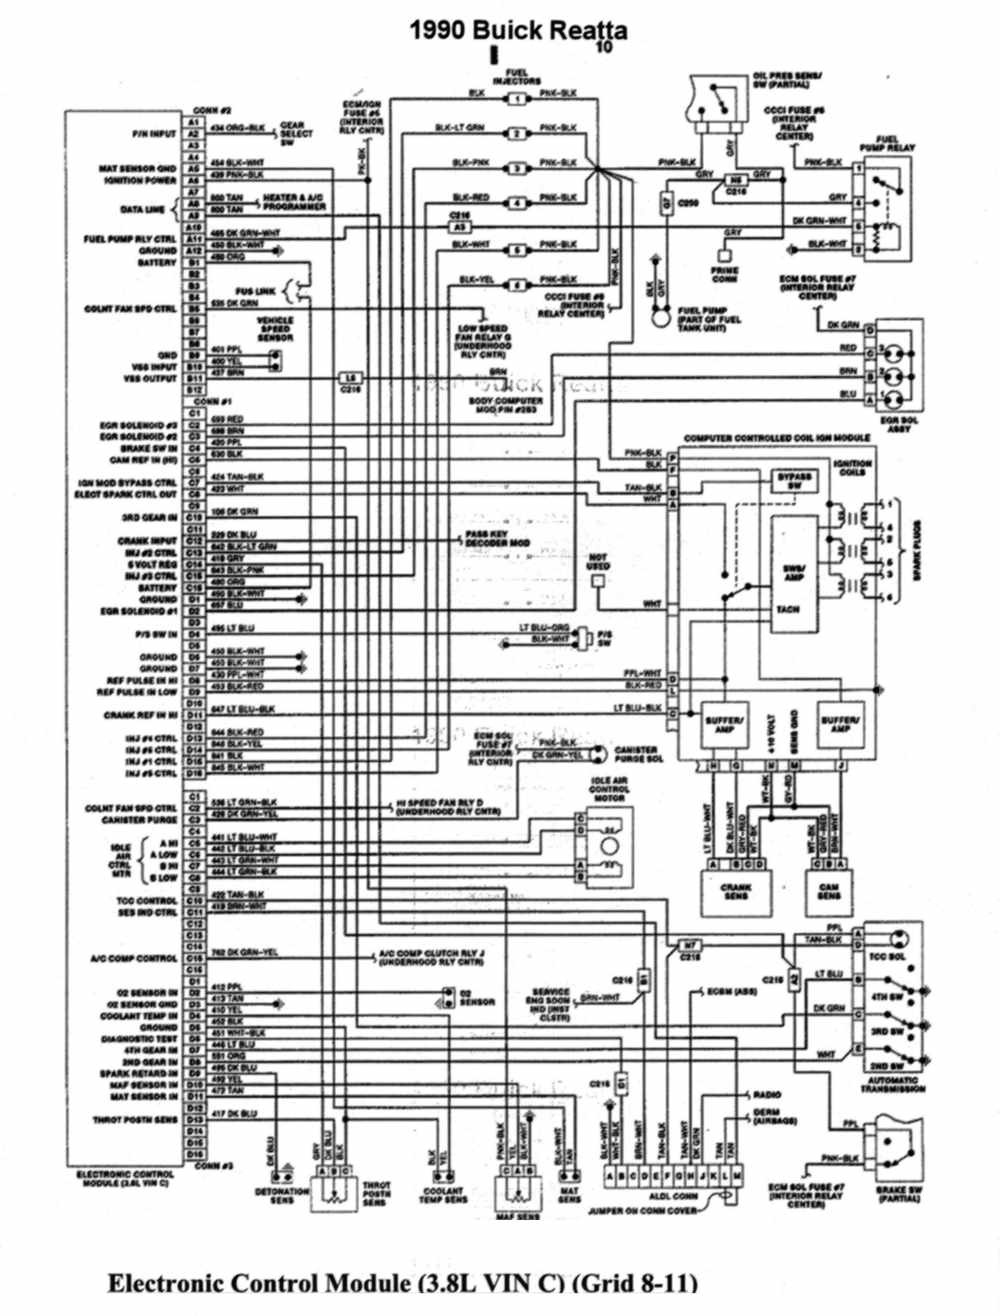 Buick Reatta Wiring Diagram - Wiring Diagram Data on